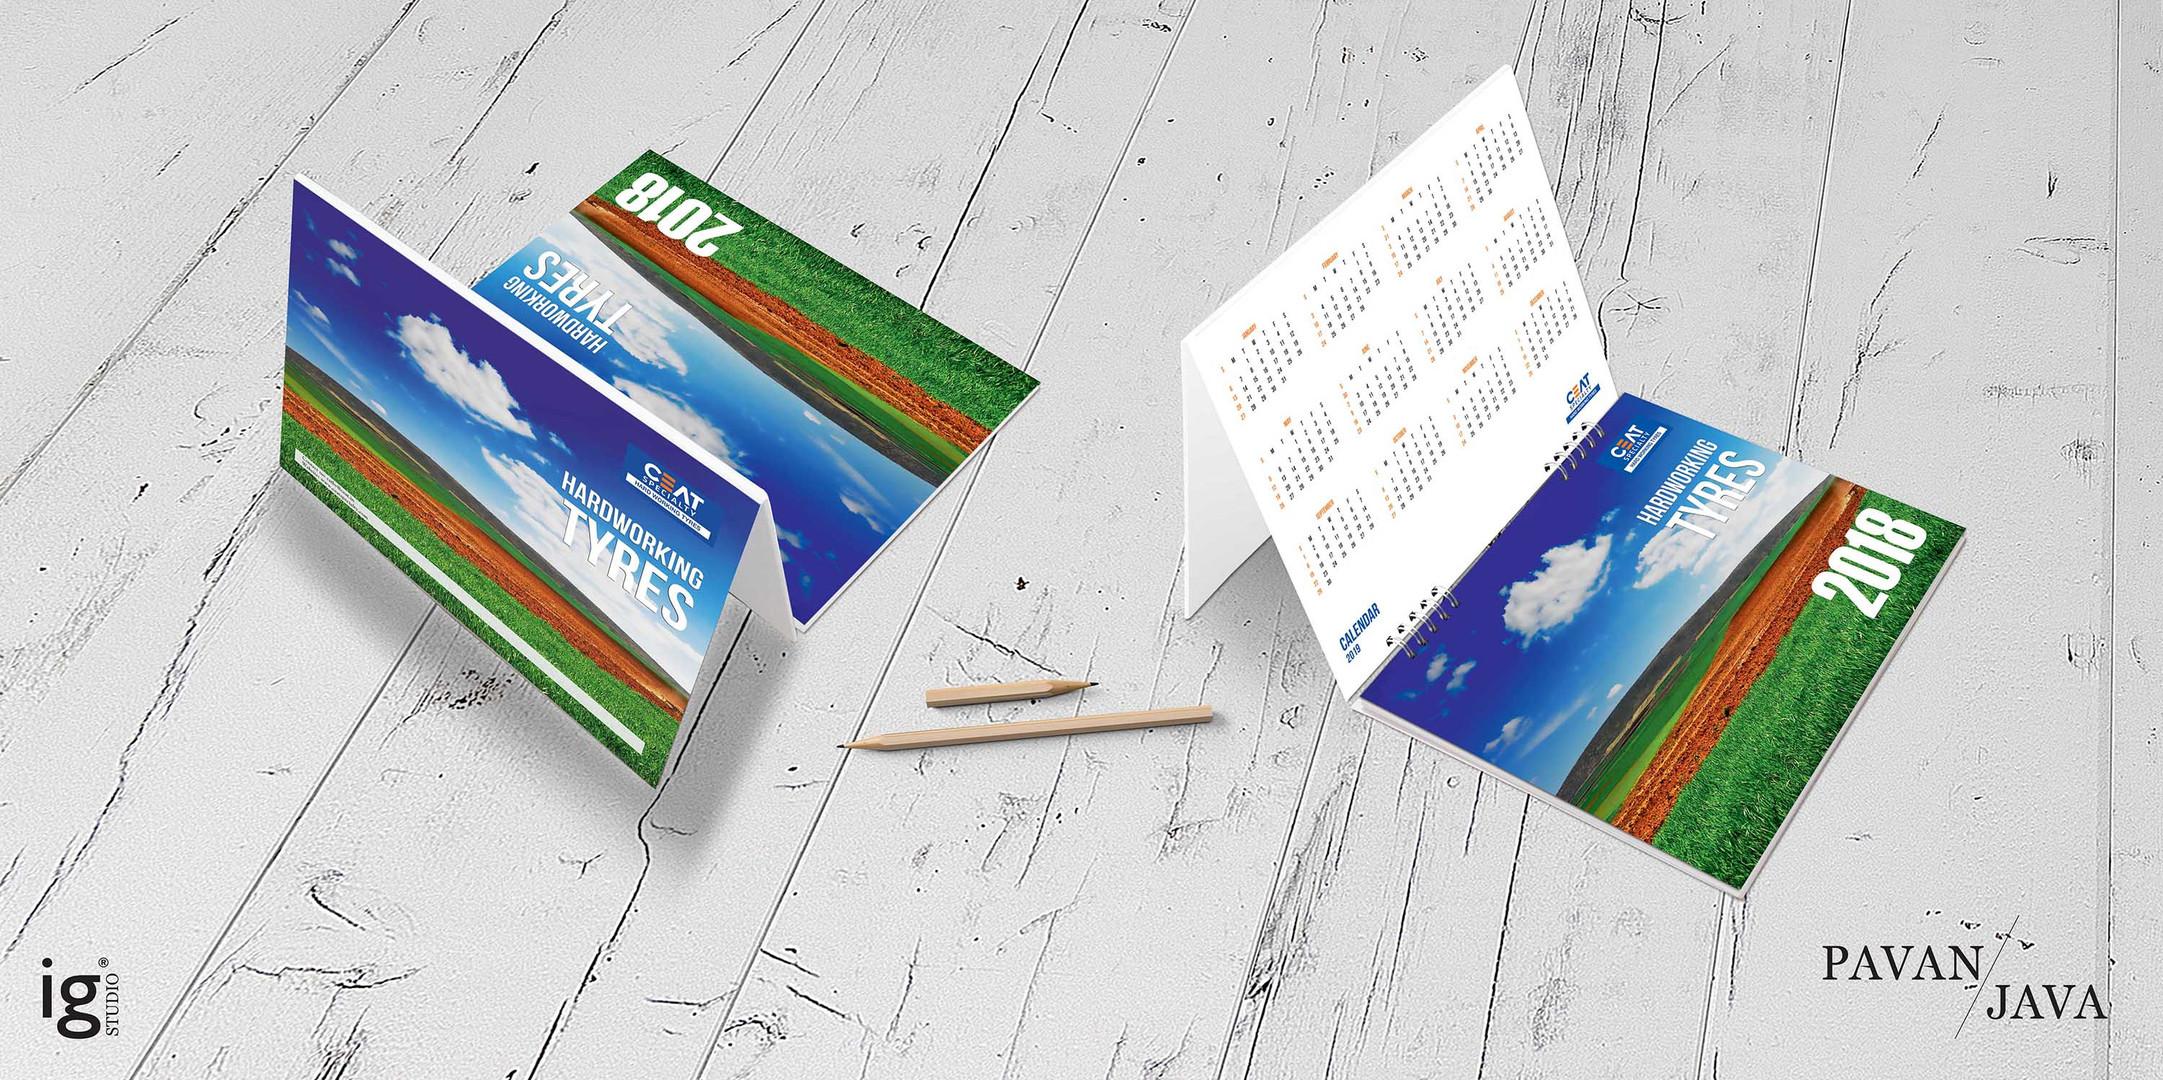 Ceat International OTR Desk Calendar